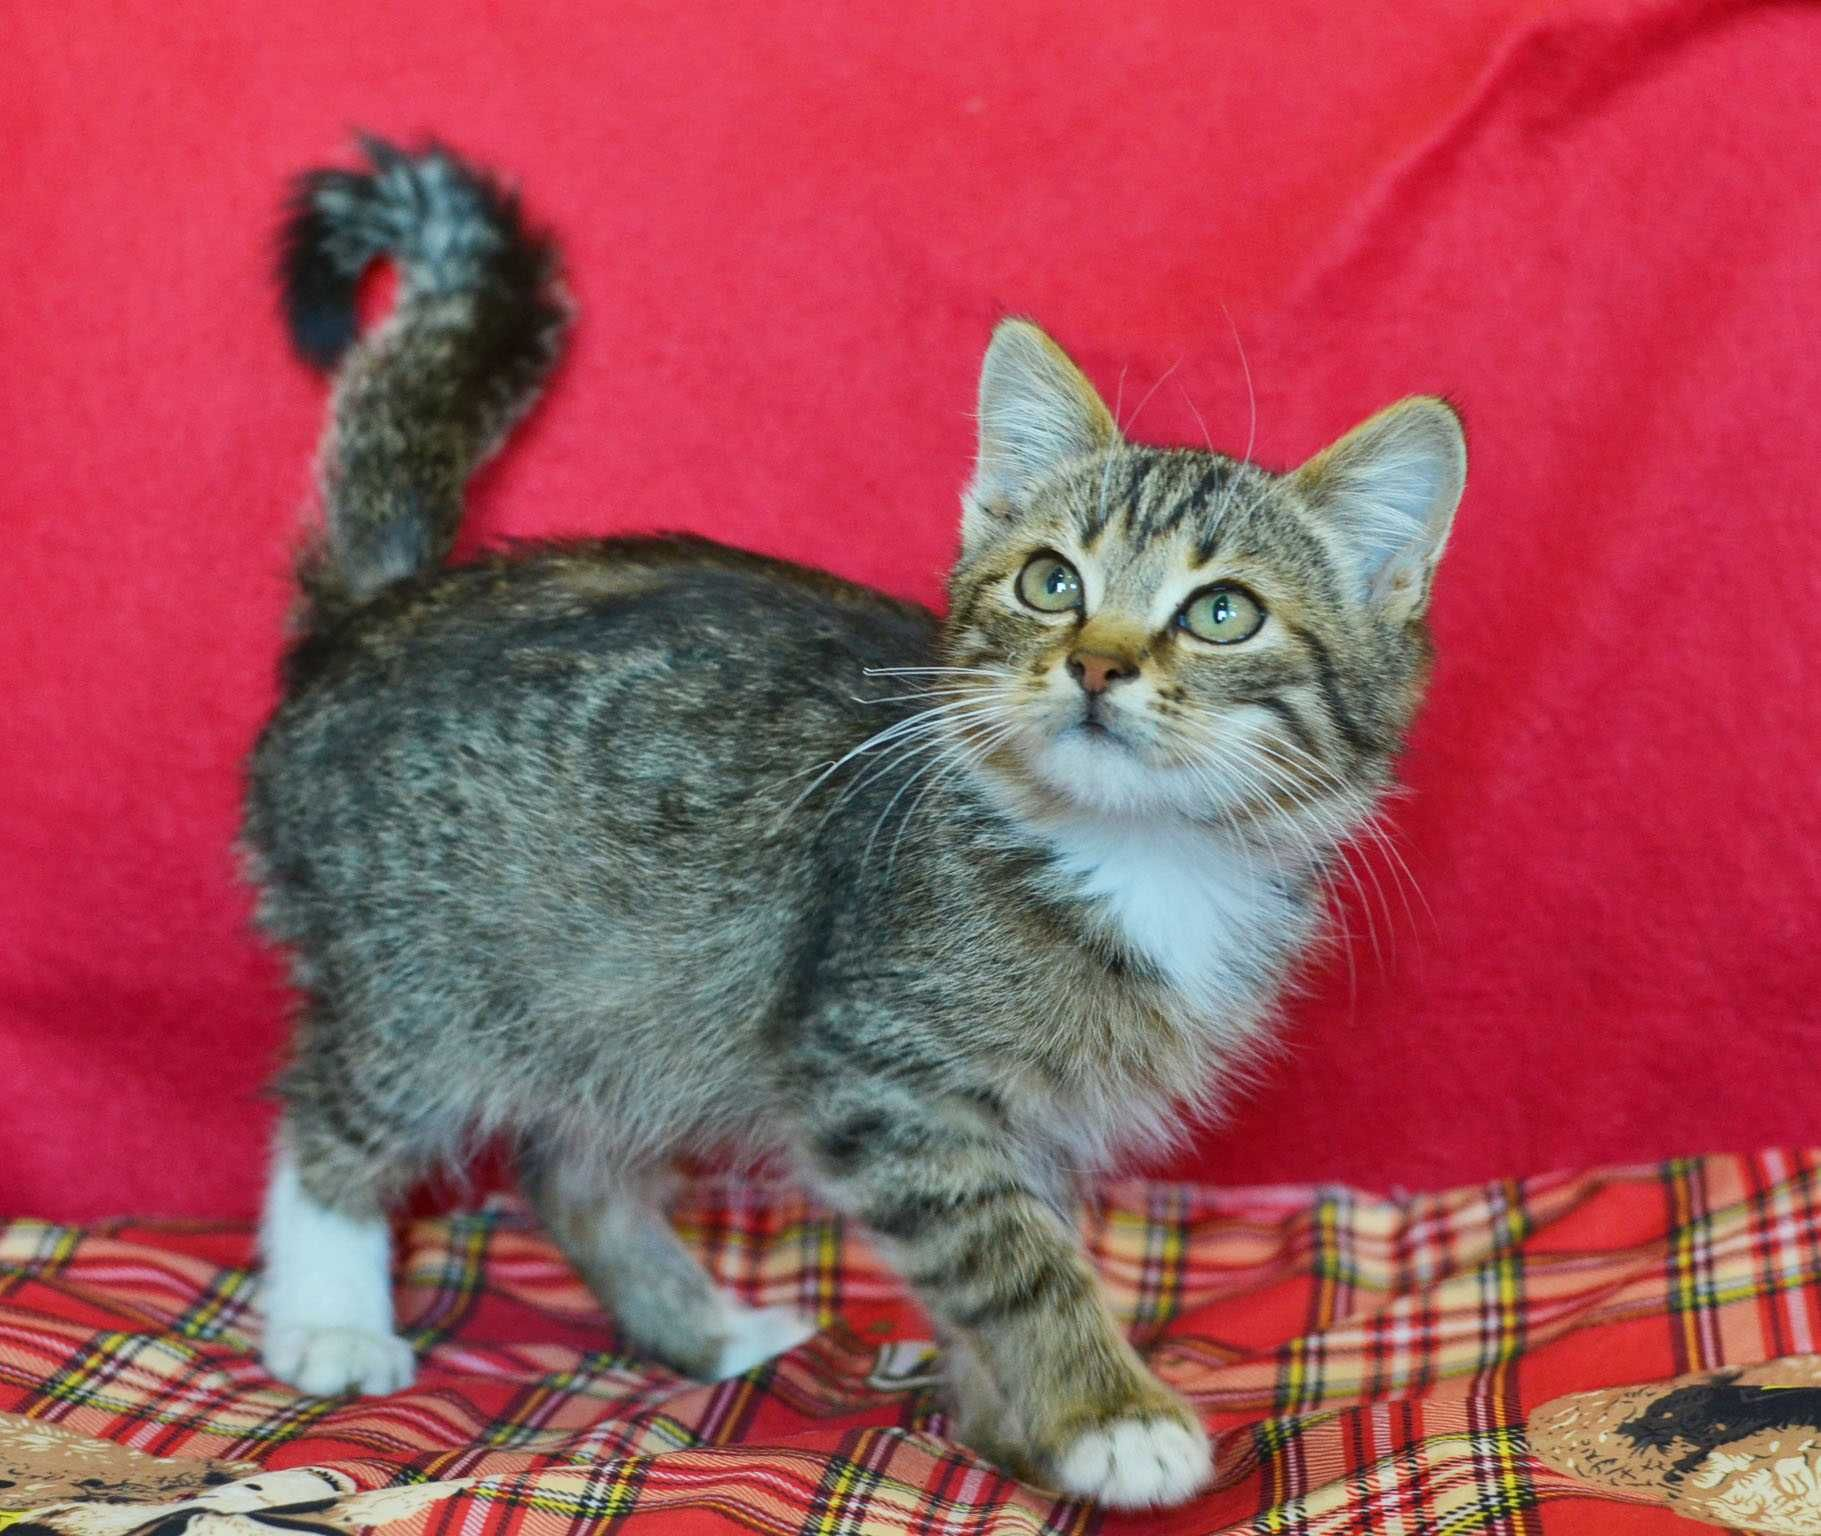 Котик Філя, 2 міс., гарне смугасте забарвлення, дуже ласкаве кошеня